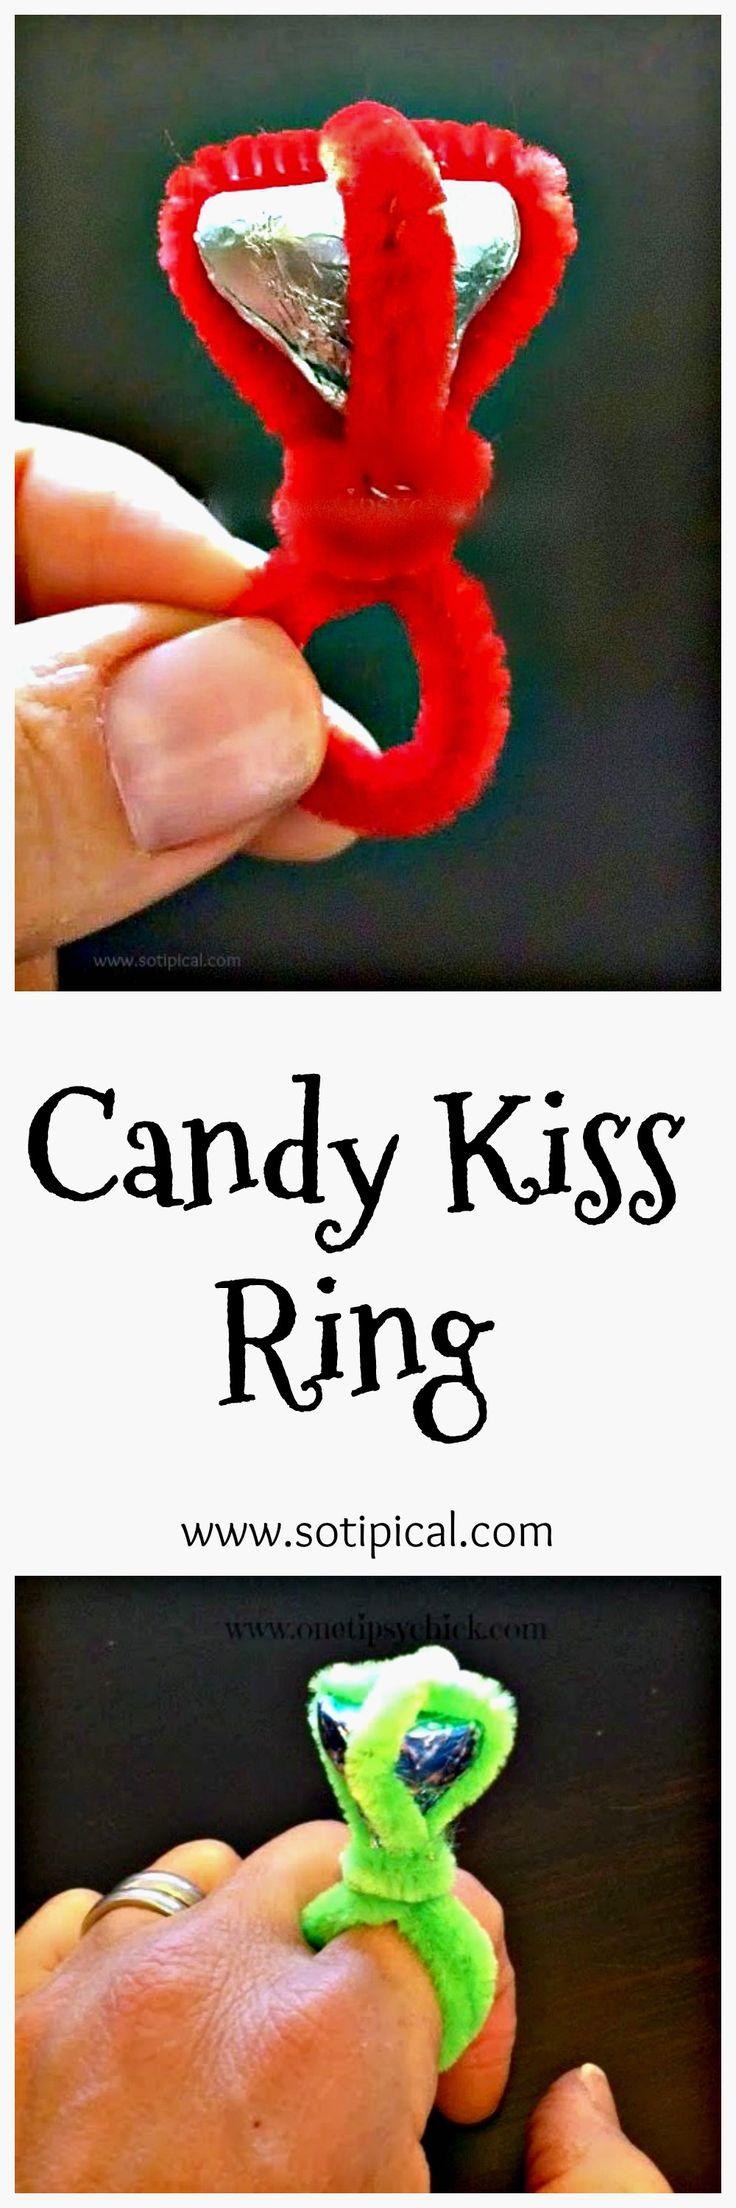 2db54e3d3835976a7c5f851e2a157b27 valentine crafts valentine ideas - Candy Kiss Ring 🍫|♡♢